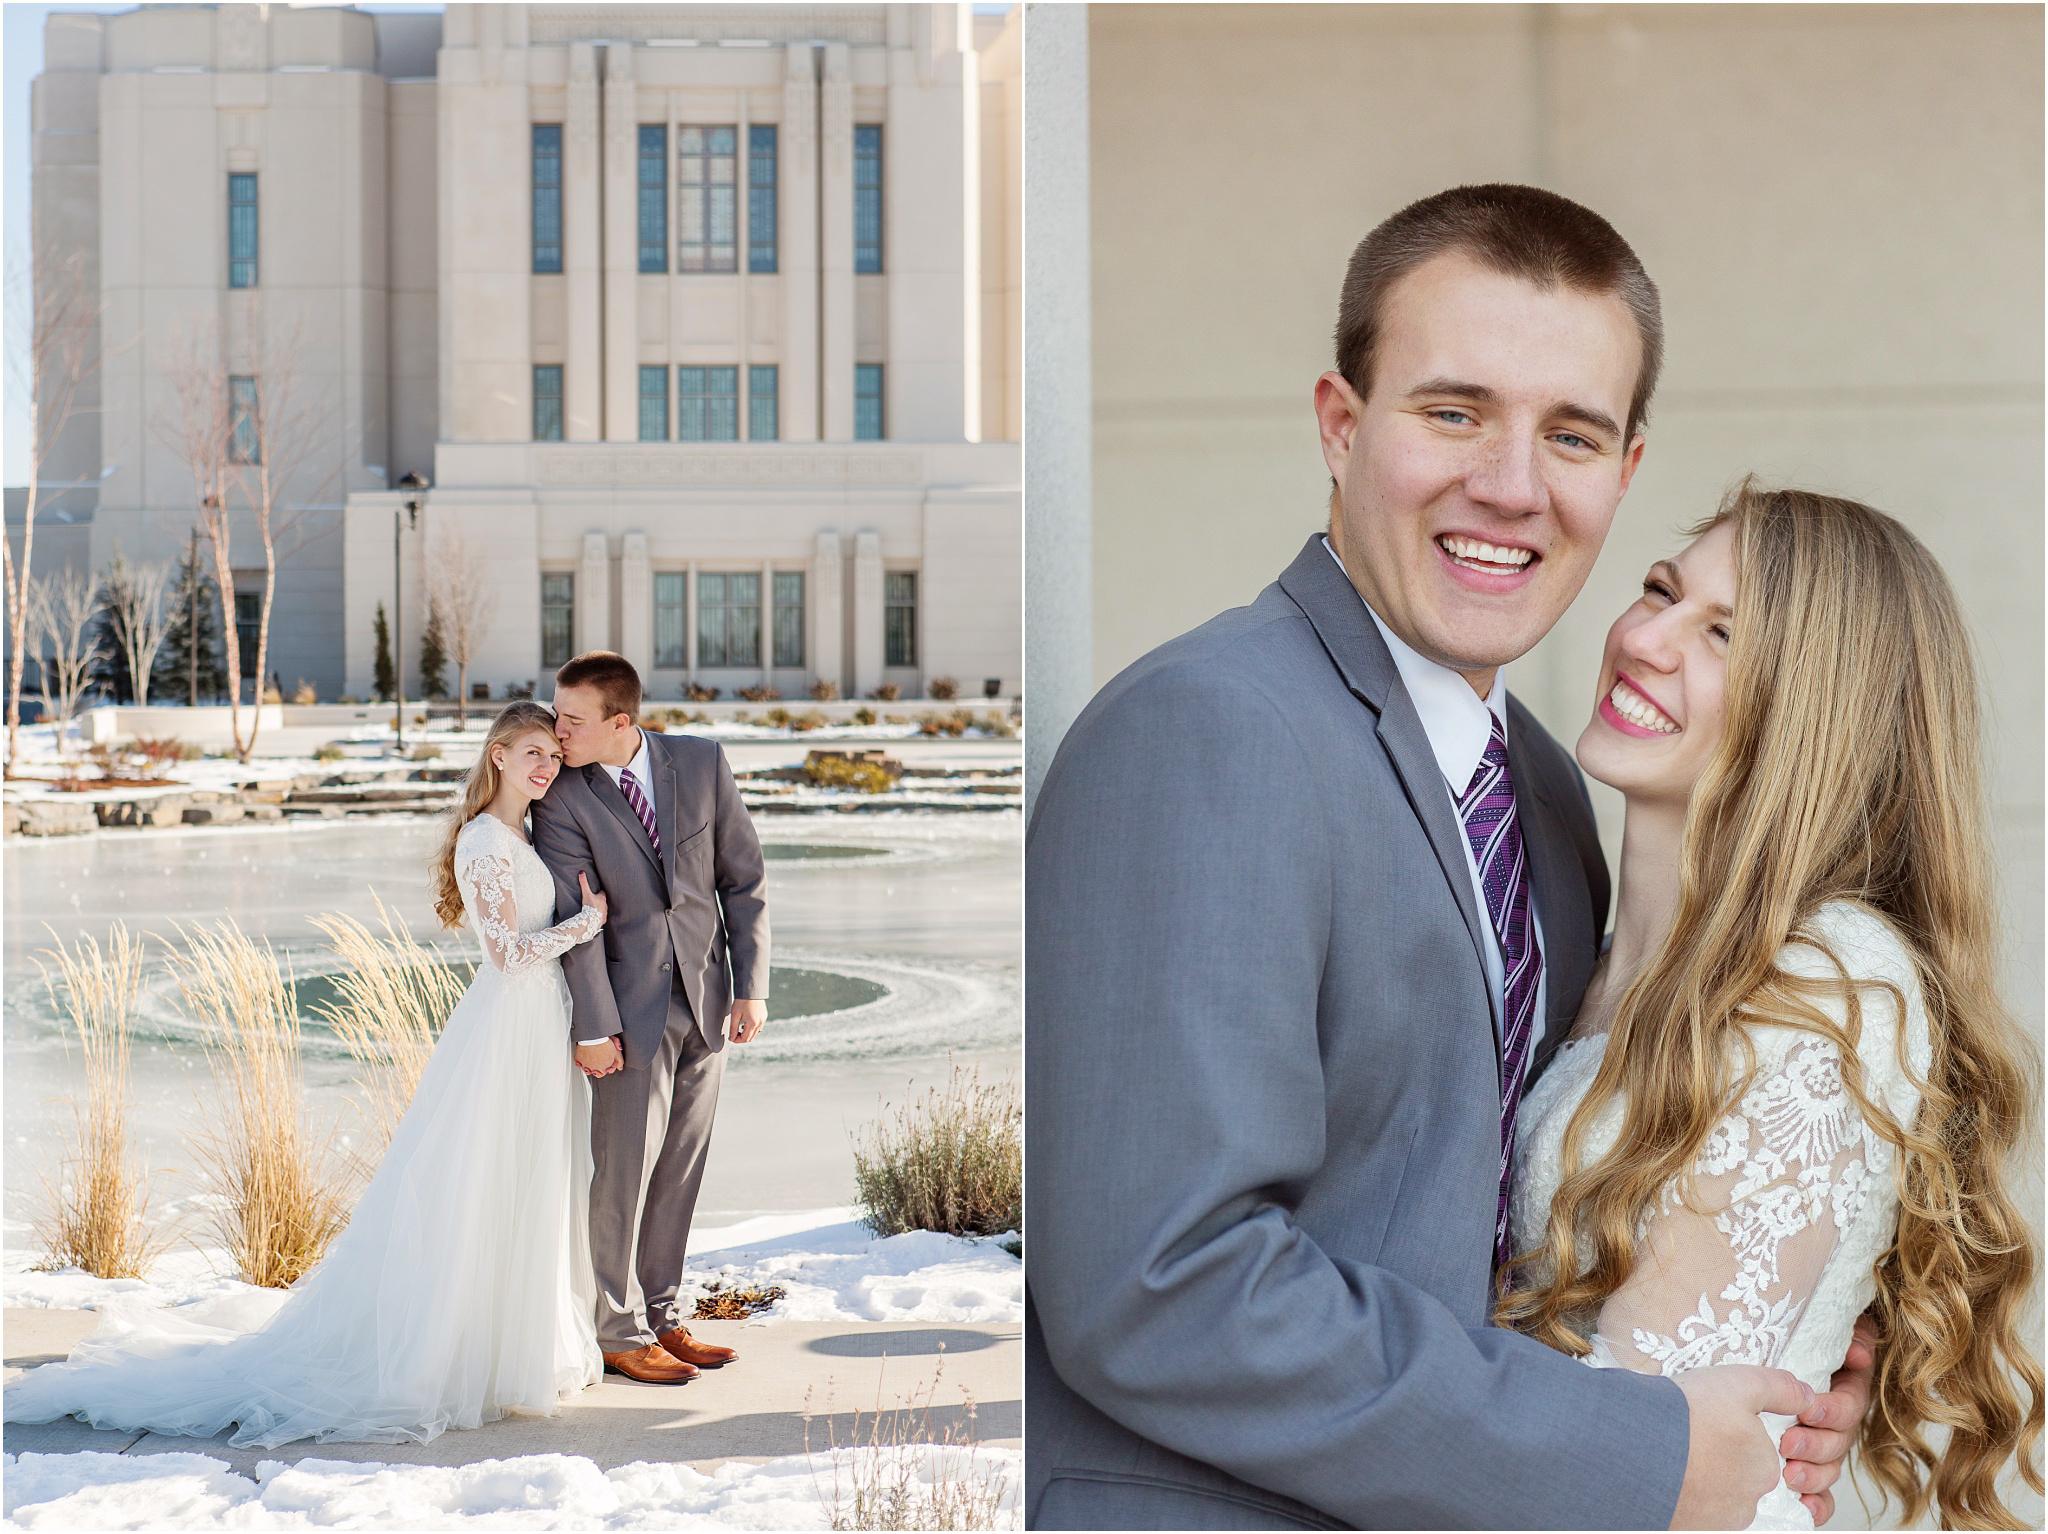 Wedding Photography_Meridian Idaho Temple_Boise Idaho_Leah Southwick Photography_0012.jpg